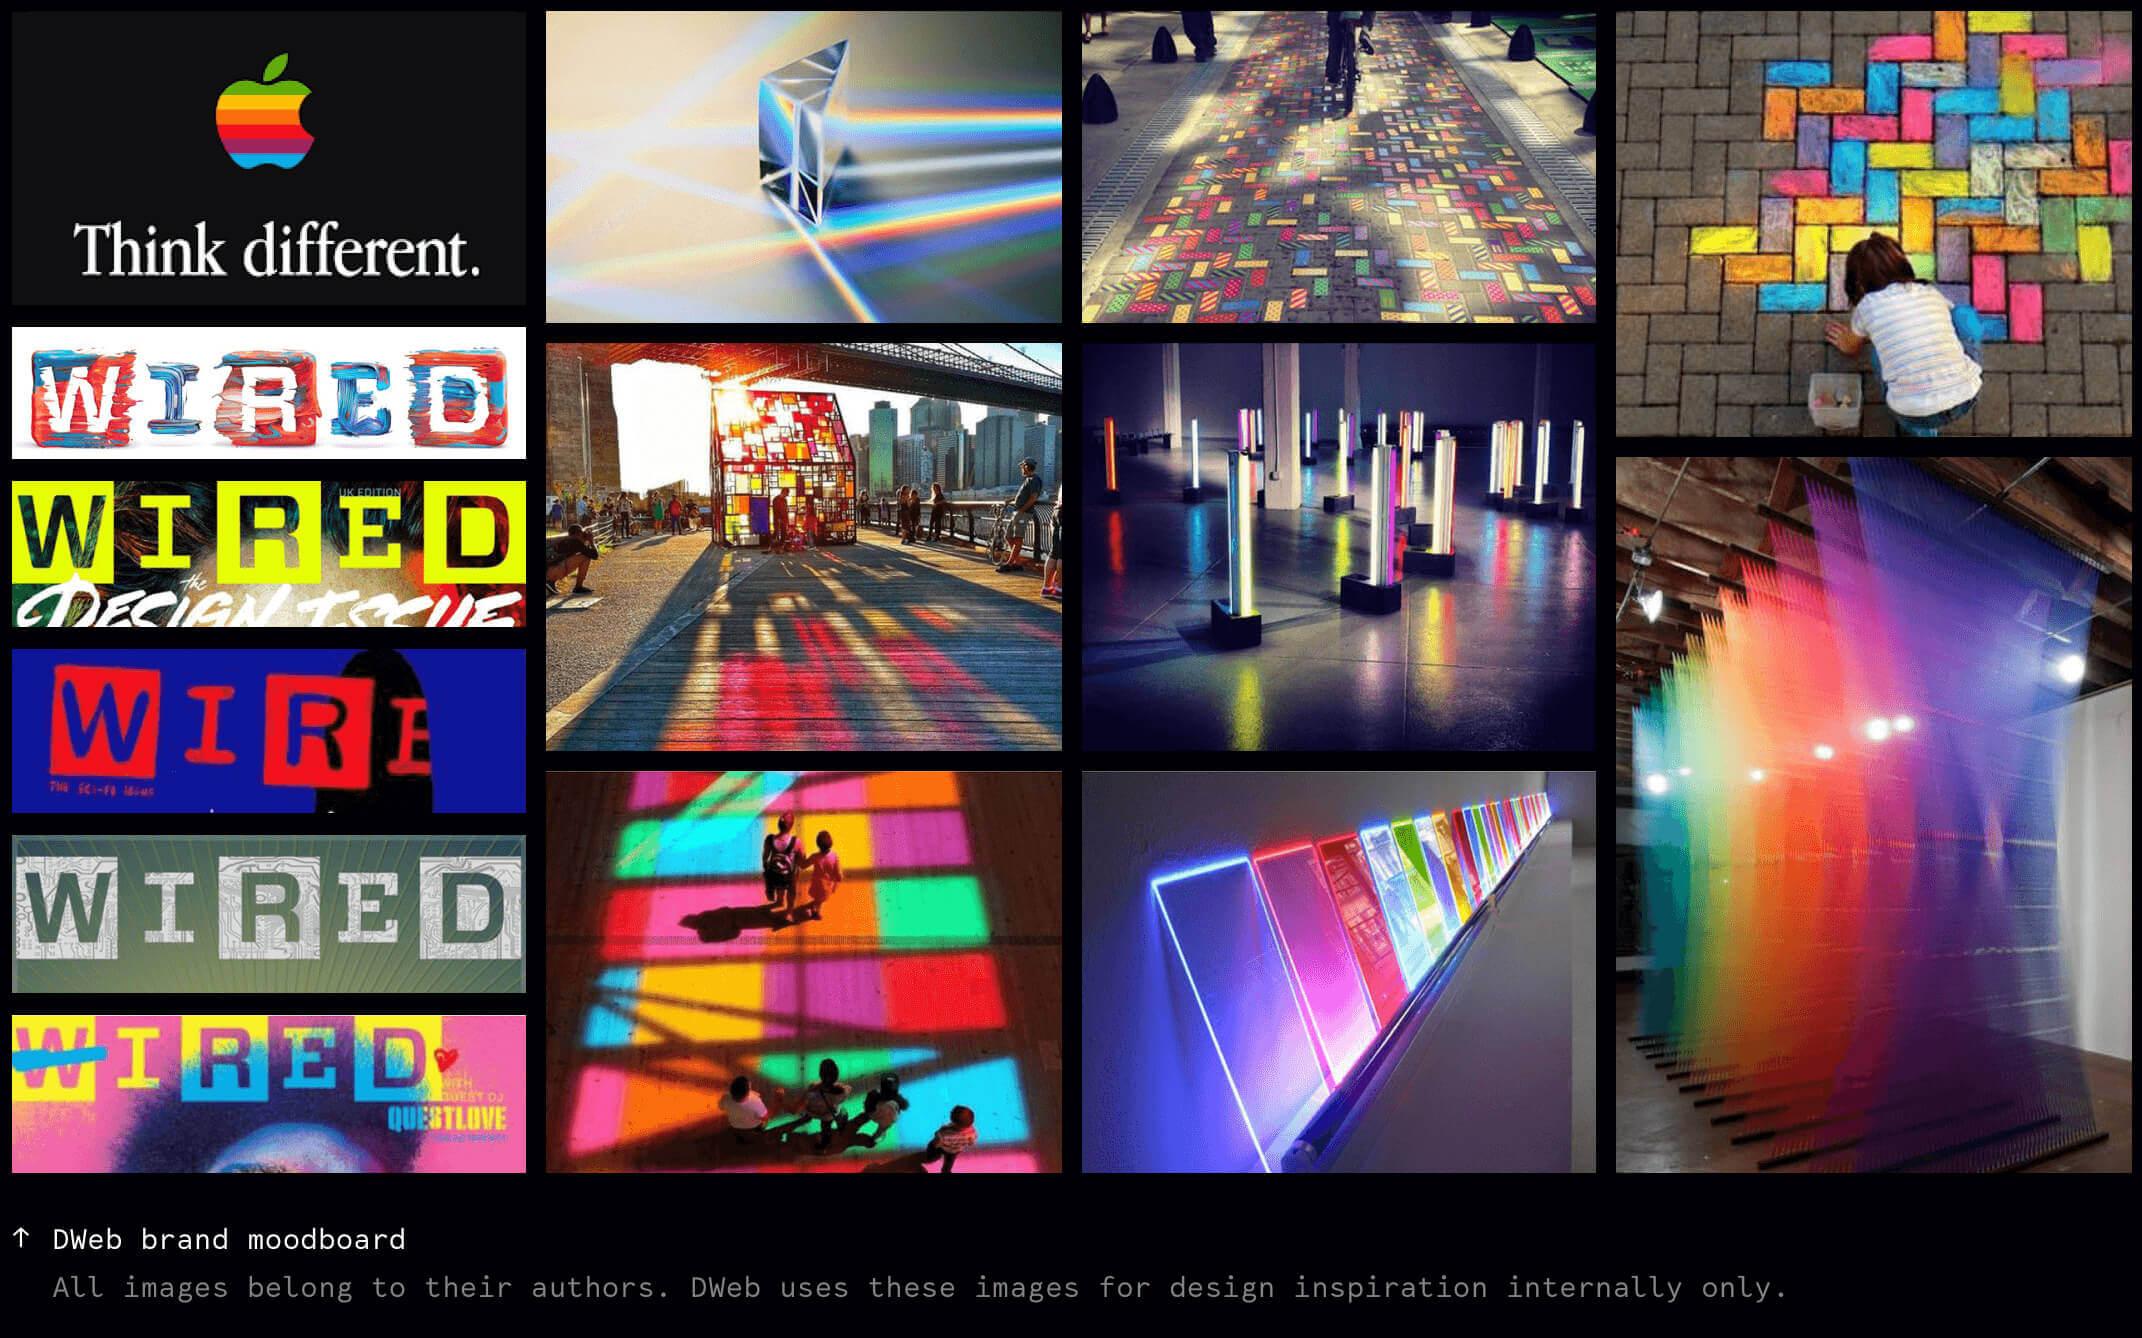 decentralized web branding Nezhynska moodboard